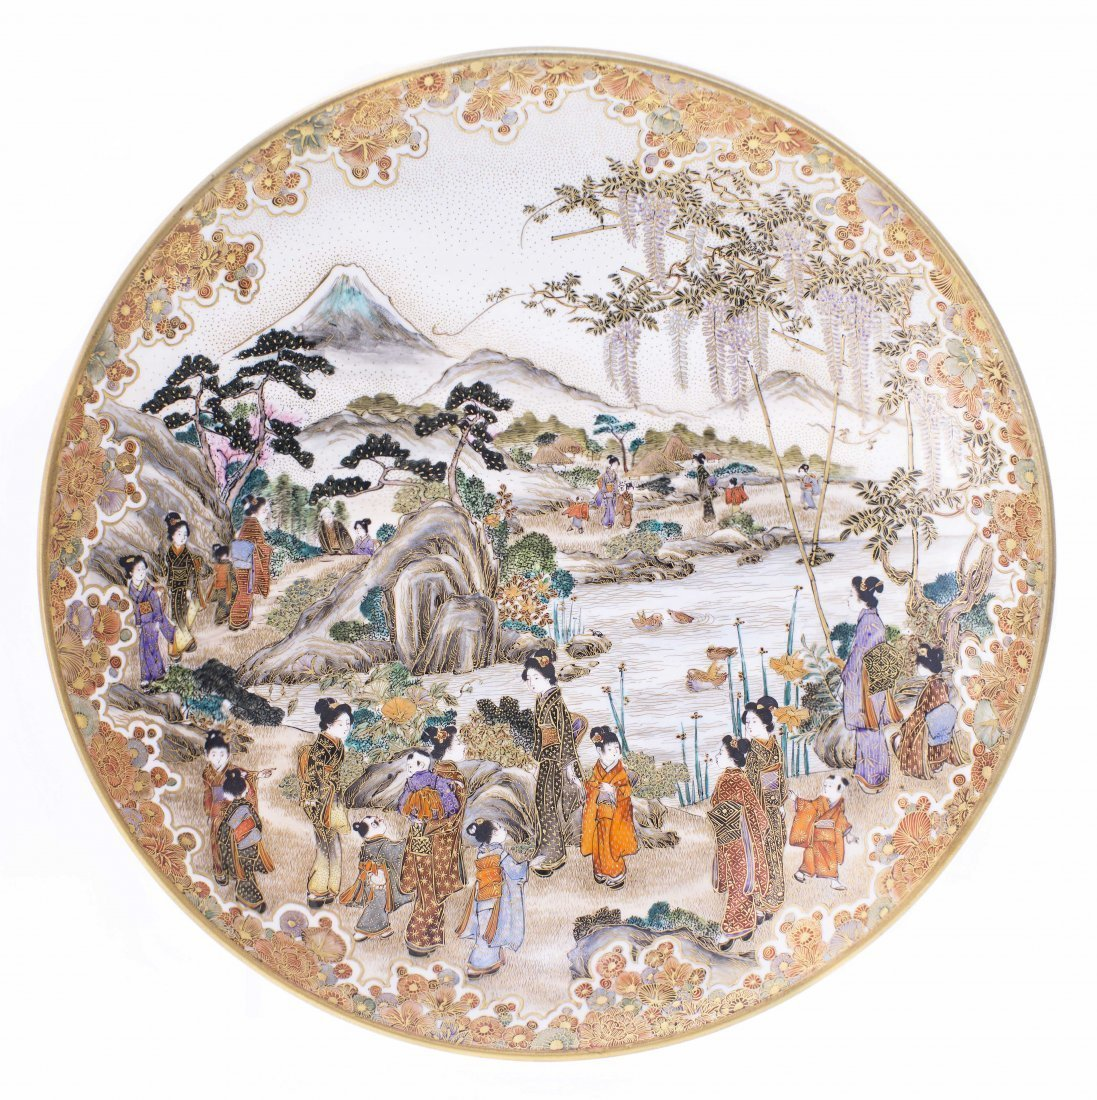 JAPANESE SATSUMA DISH, KINKOZAN ZO, MEIJI PERIOD